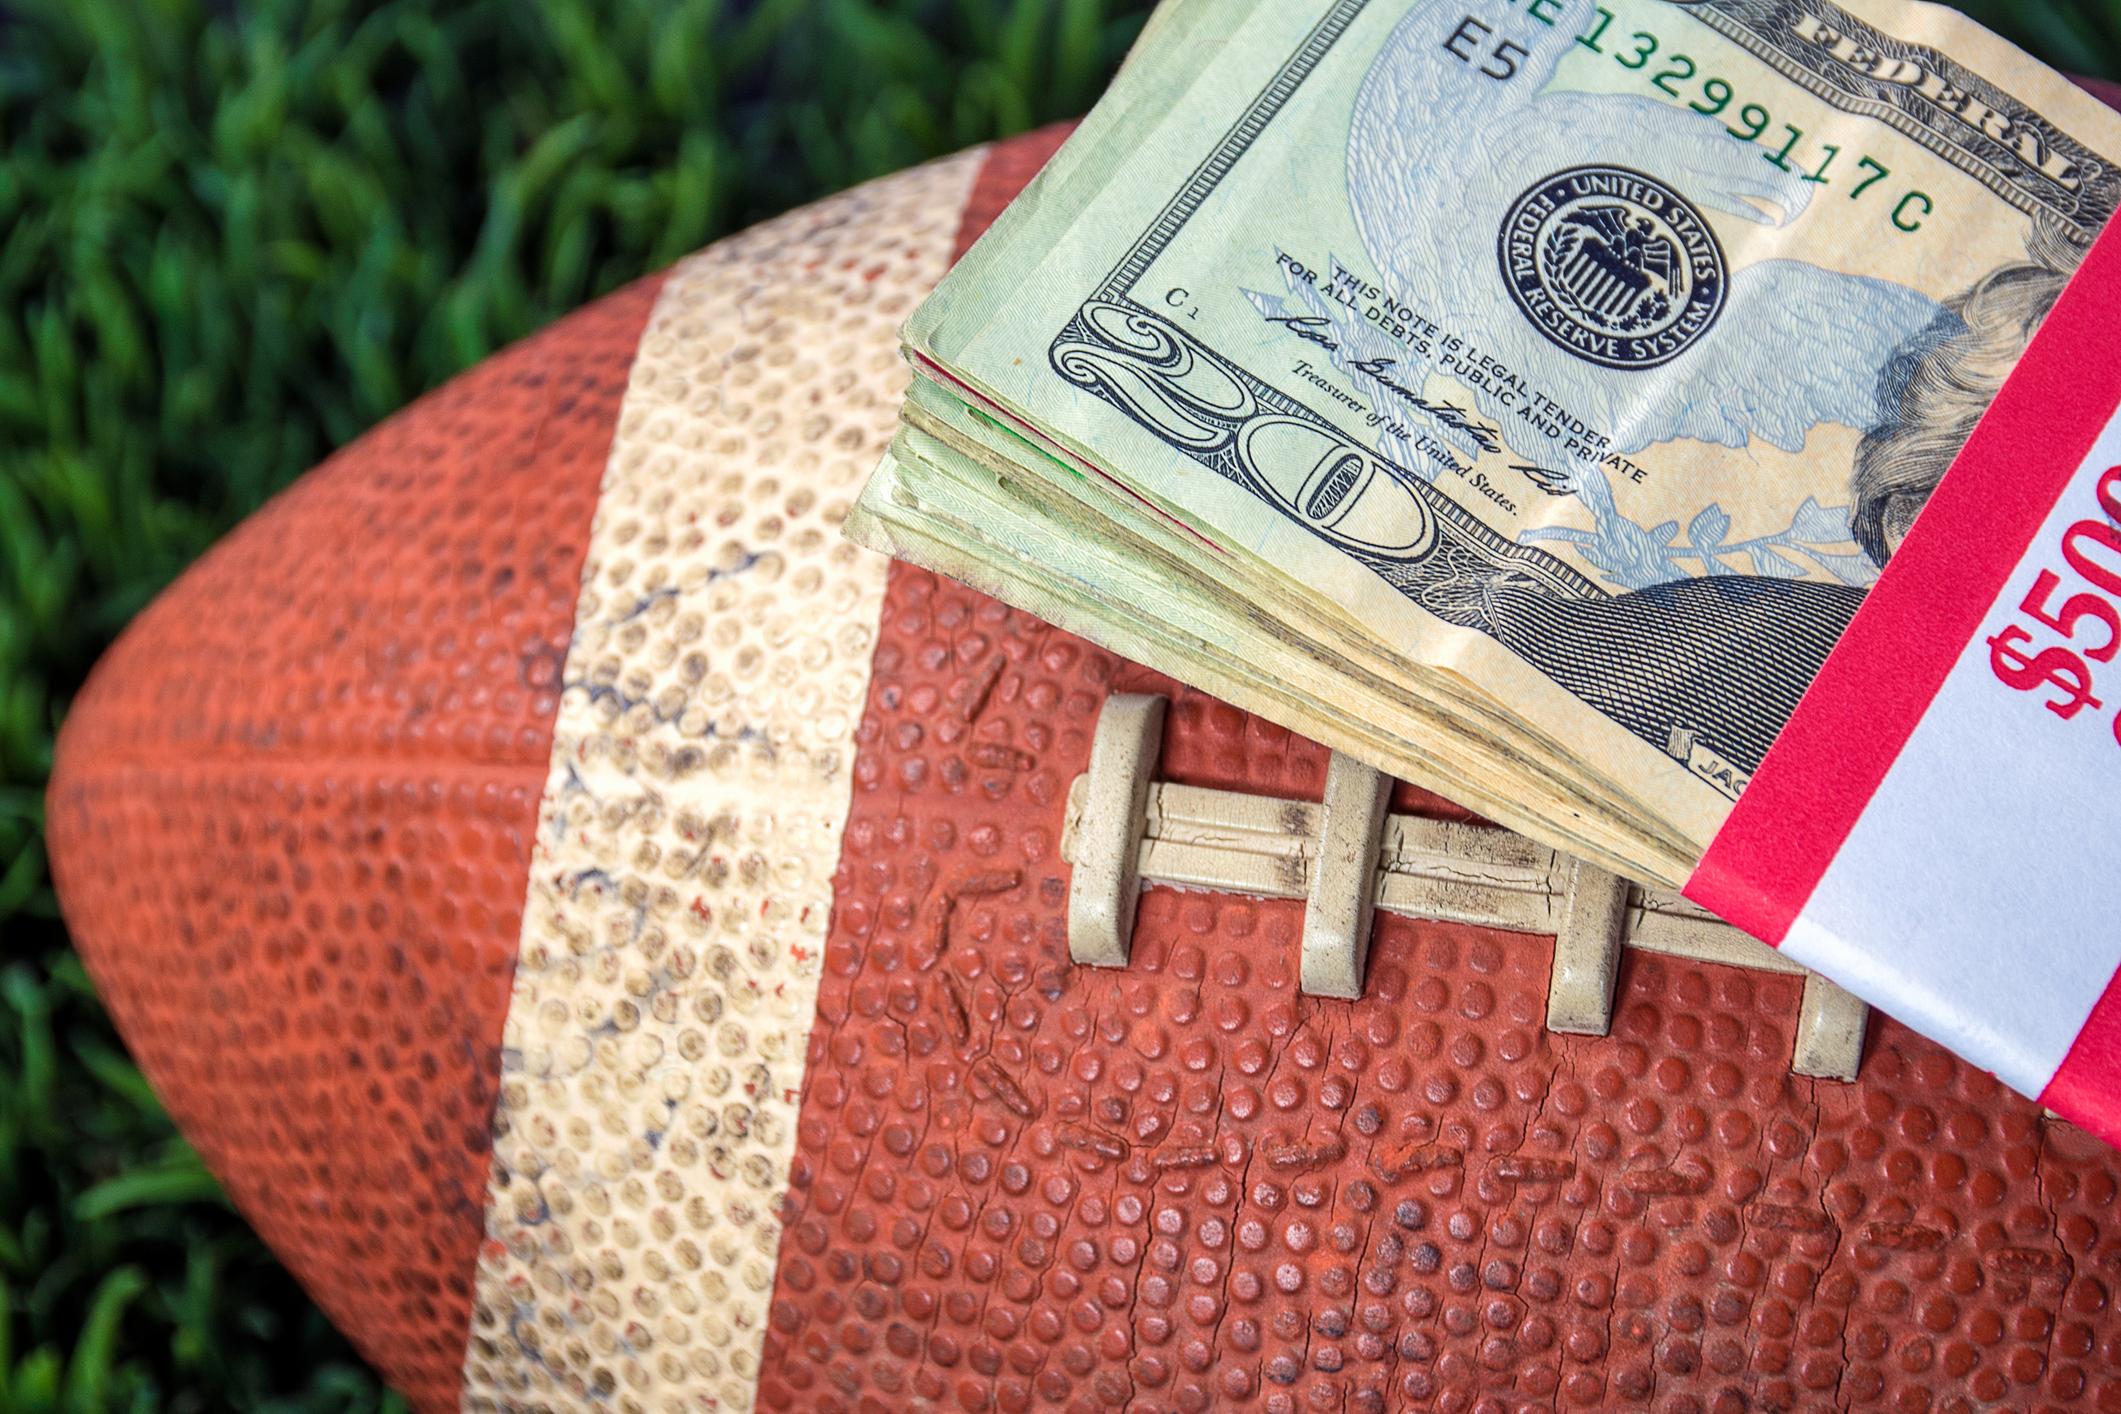 Money on a football.